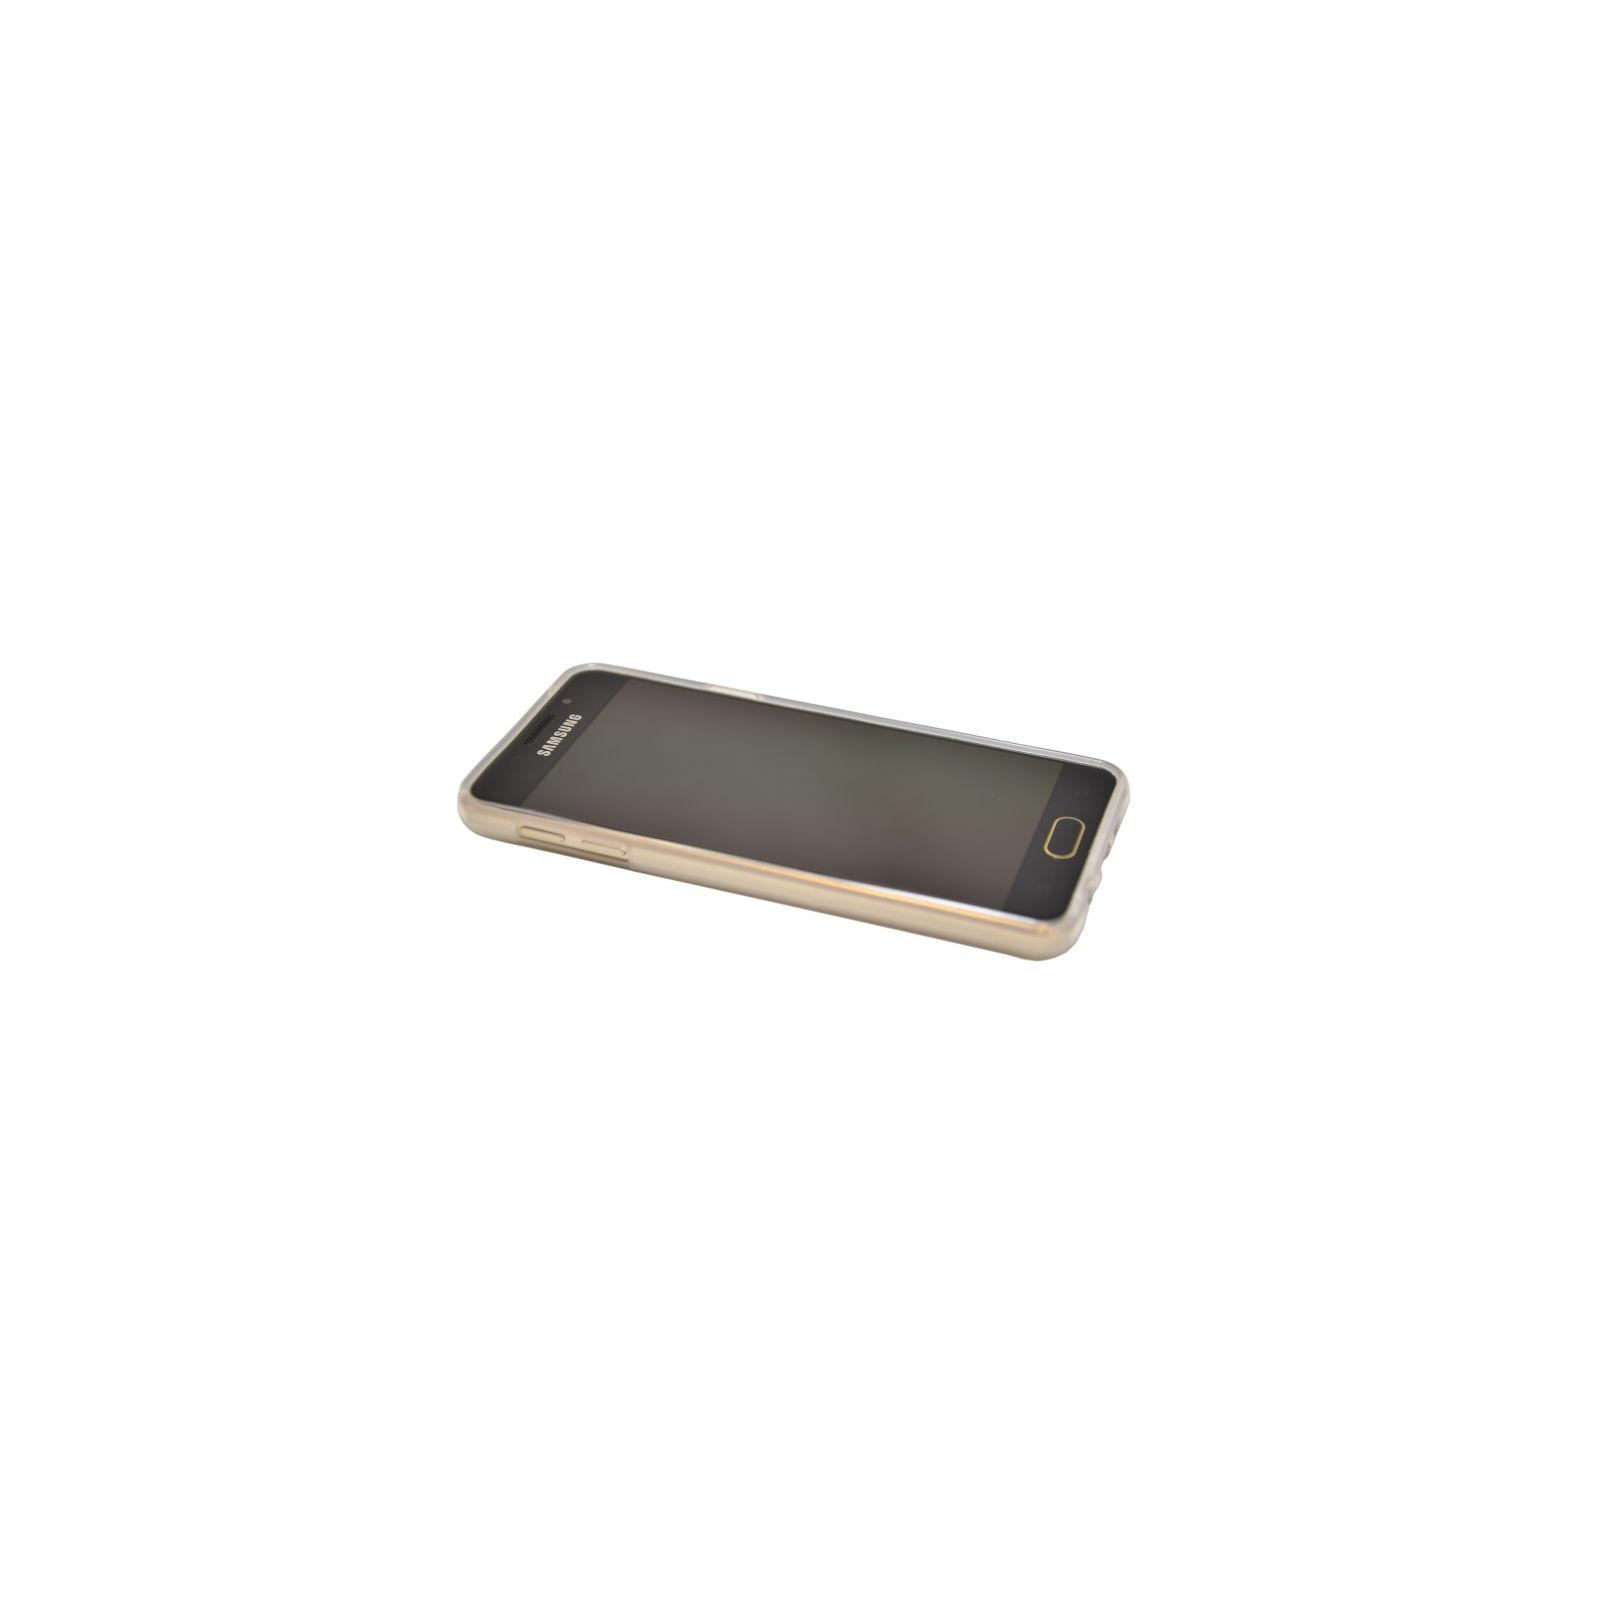 Чехол для моб. телефона Pro-case для Samsung Galaxy A3 (A310) White (CP-305-WHT) (CP-305-WHT) изображение 2